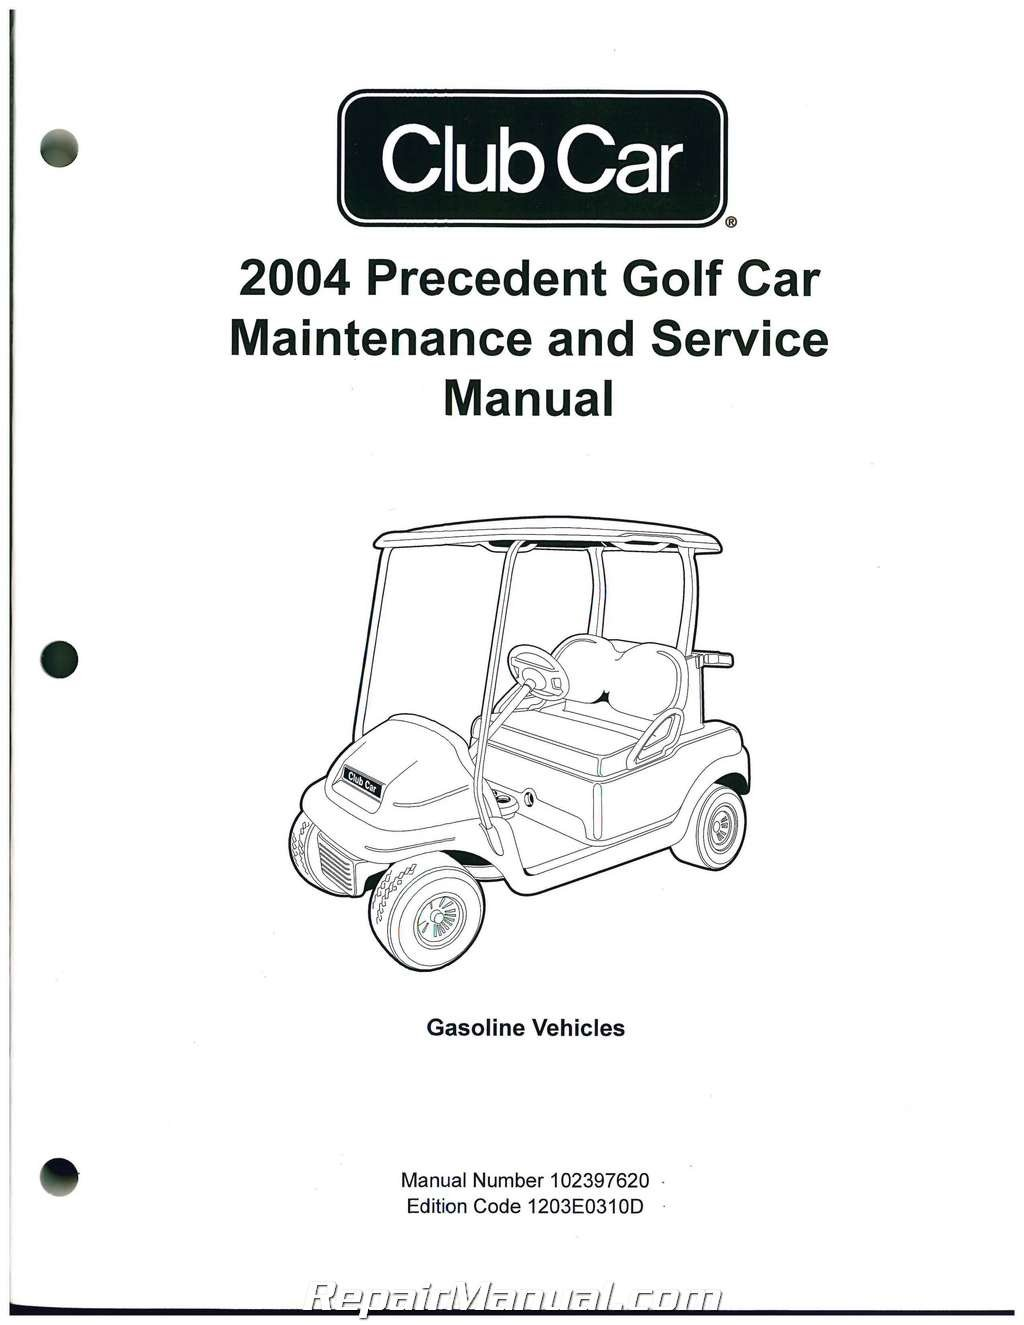 102397620 2004 Precedent Club Car Golf Cart Service Manual: by Publisher:  Amazon.com: BooksAmazon.com